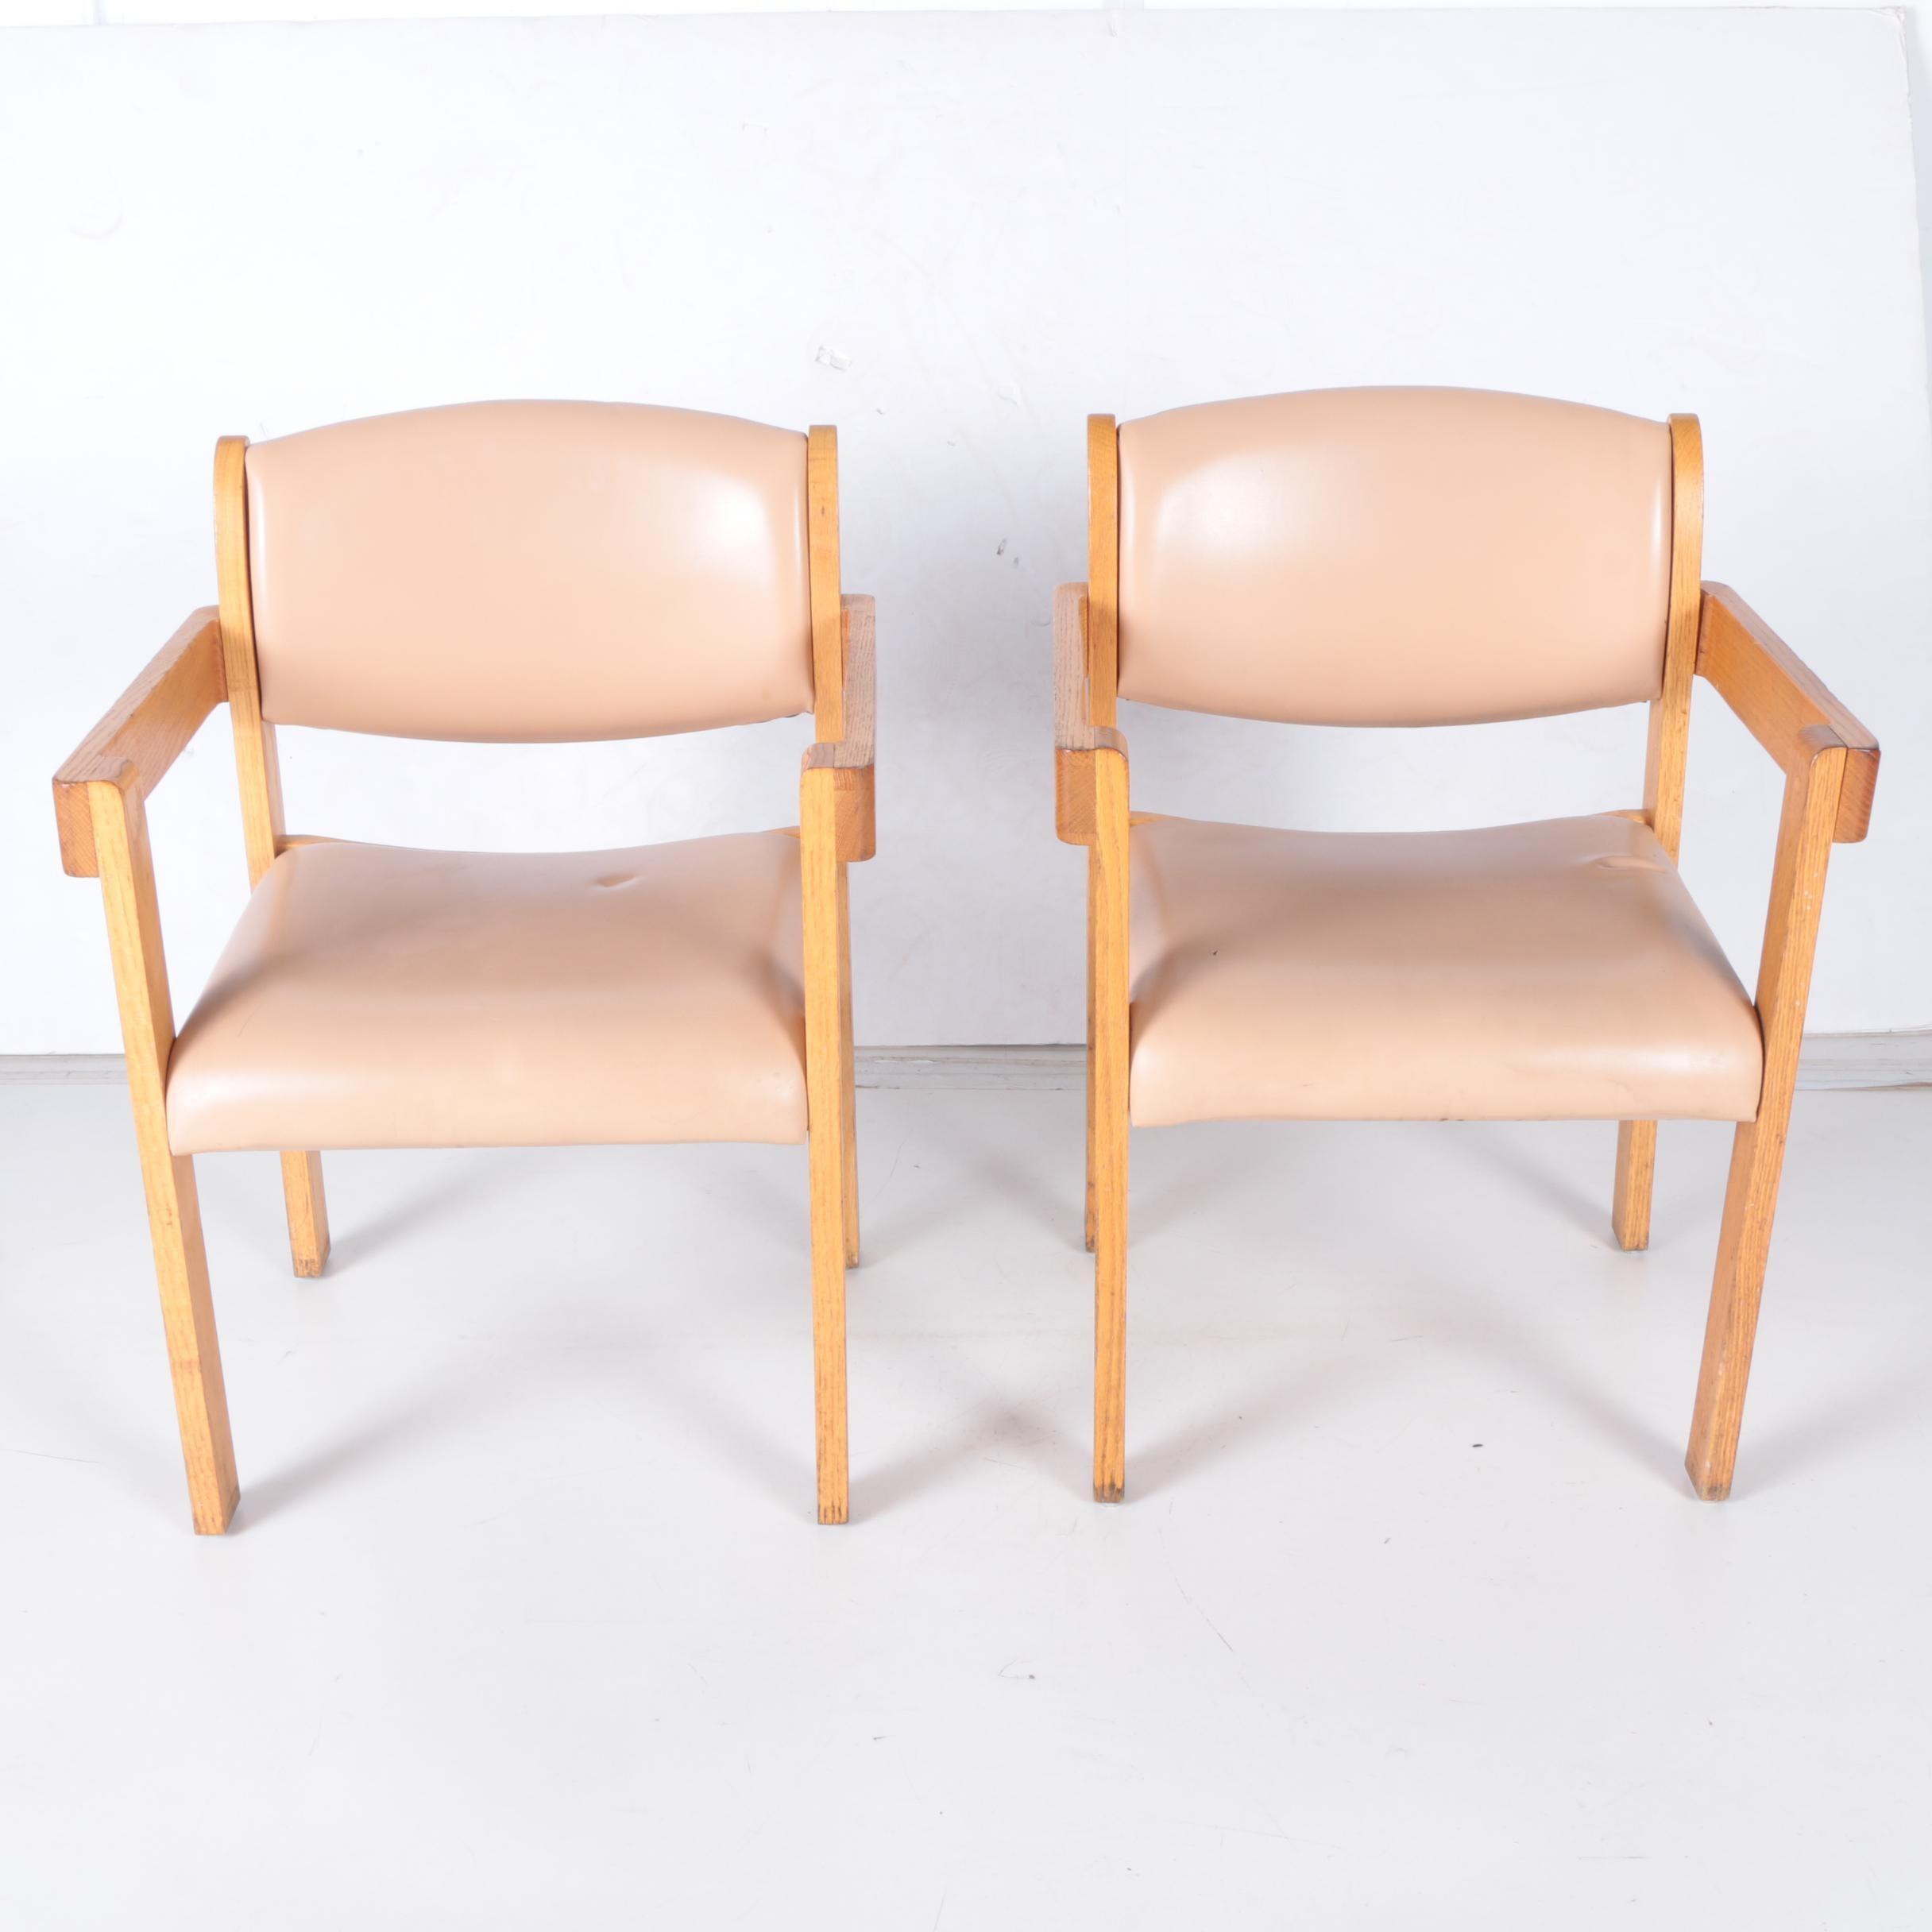 Vintage Mid Century Modern Armchairs